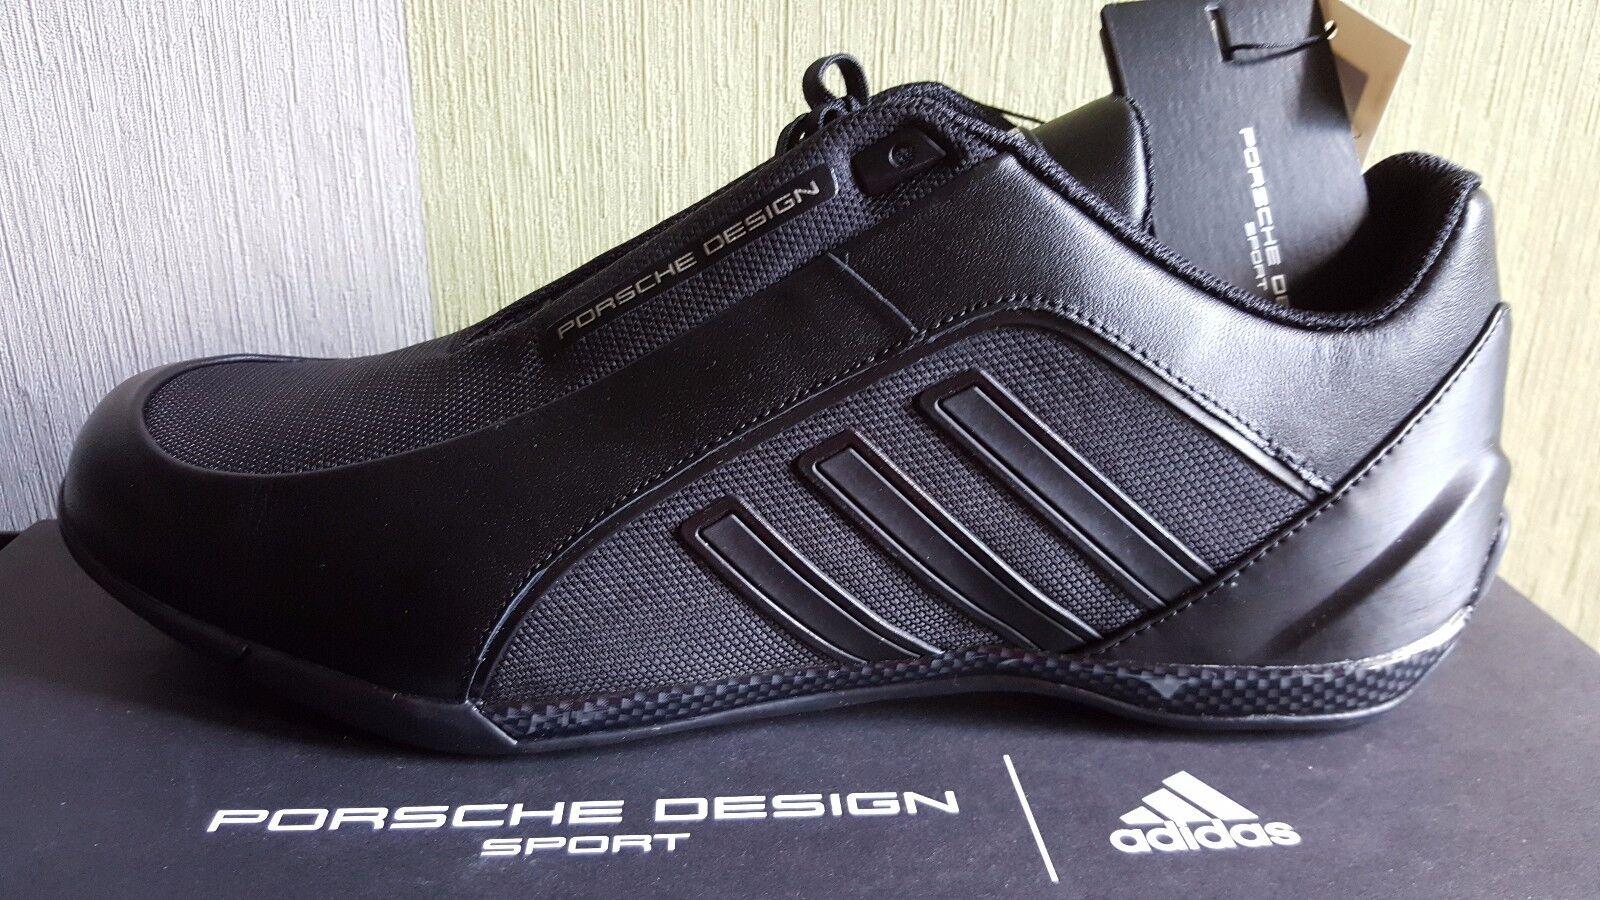 Adidas atletico porsche design scarpe da uomo atletico Adidas ii b34159 delle maglie 384504